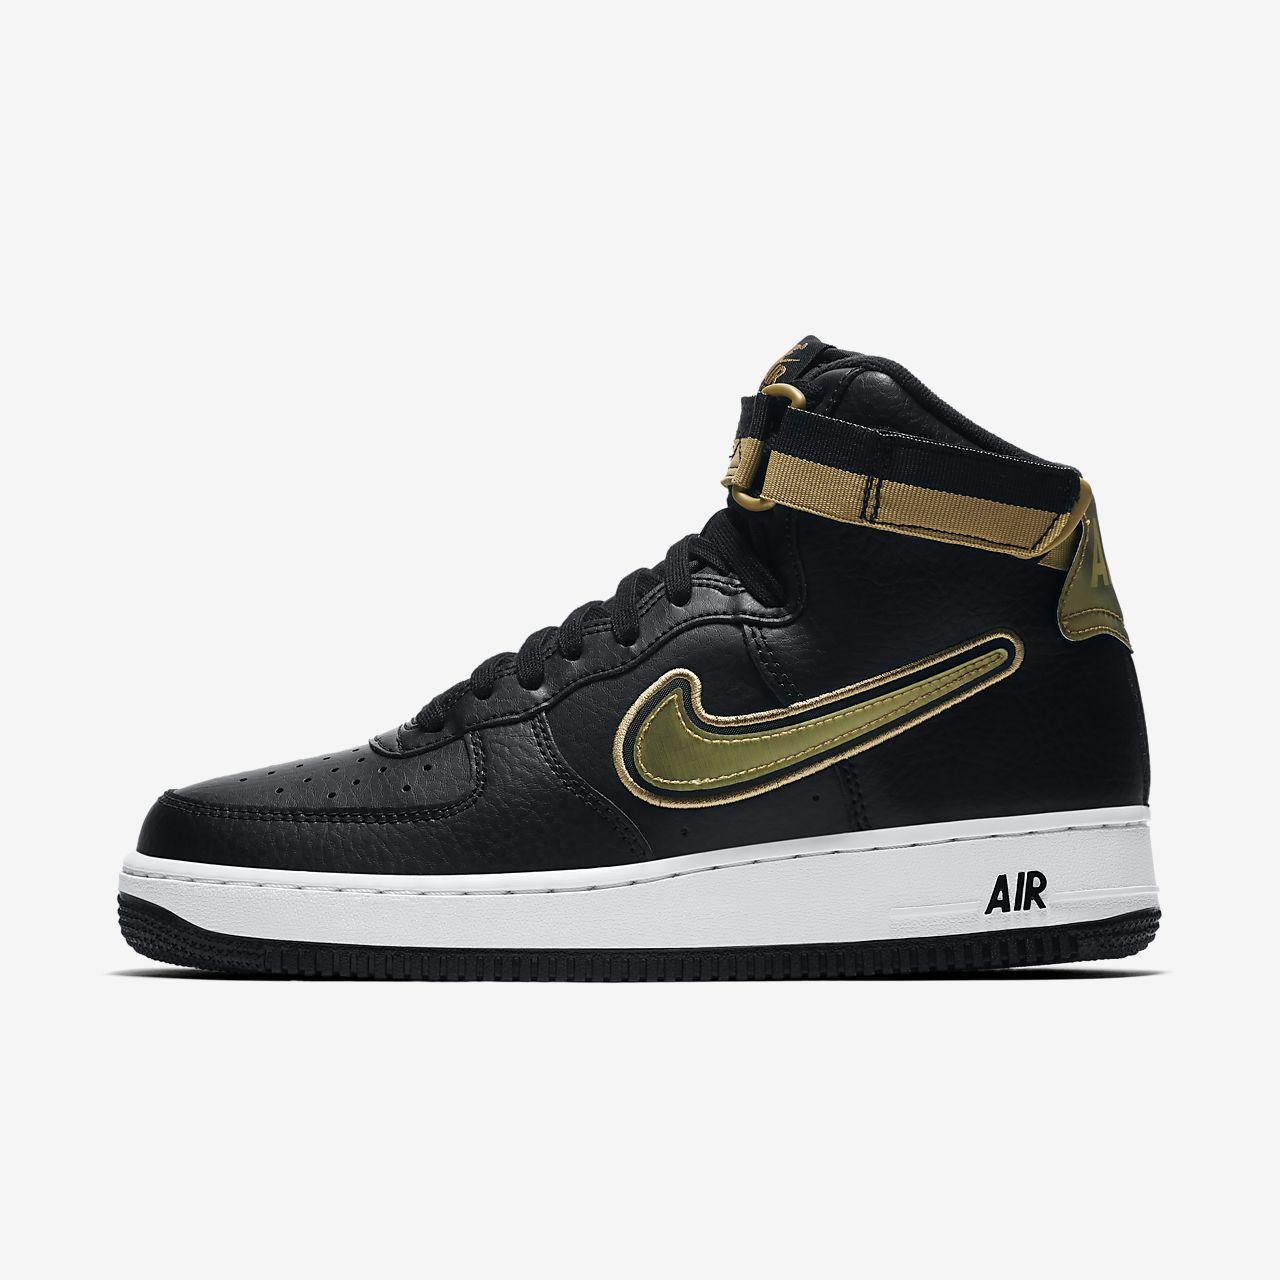 hot sale online 4b8cb d0027 Nike Air Force 1 High '07 LV8 Sport NBA Herrenschuh. Nike.com DE